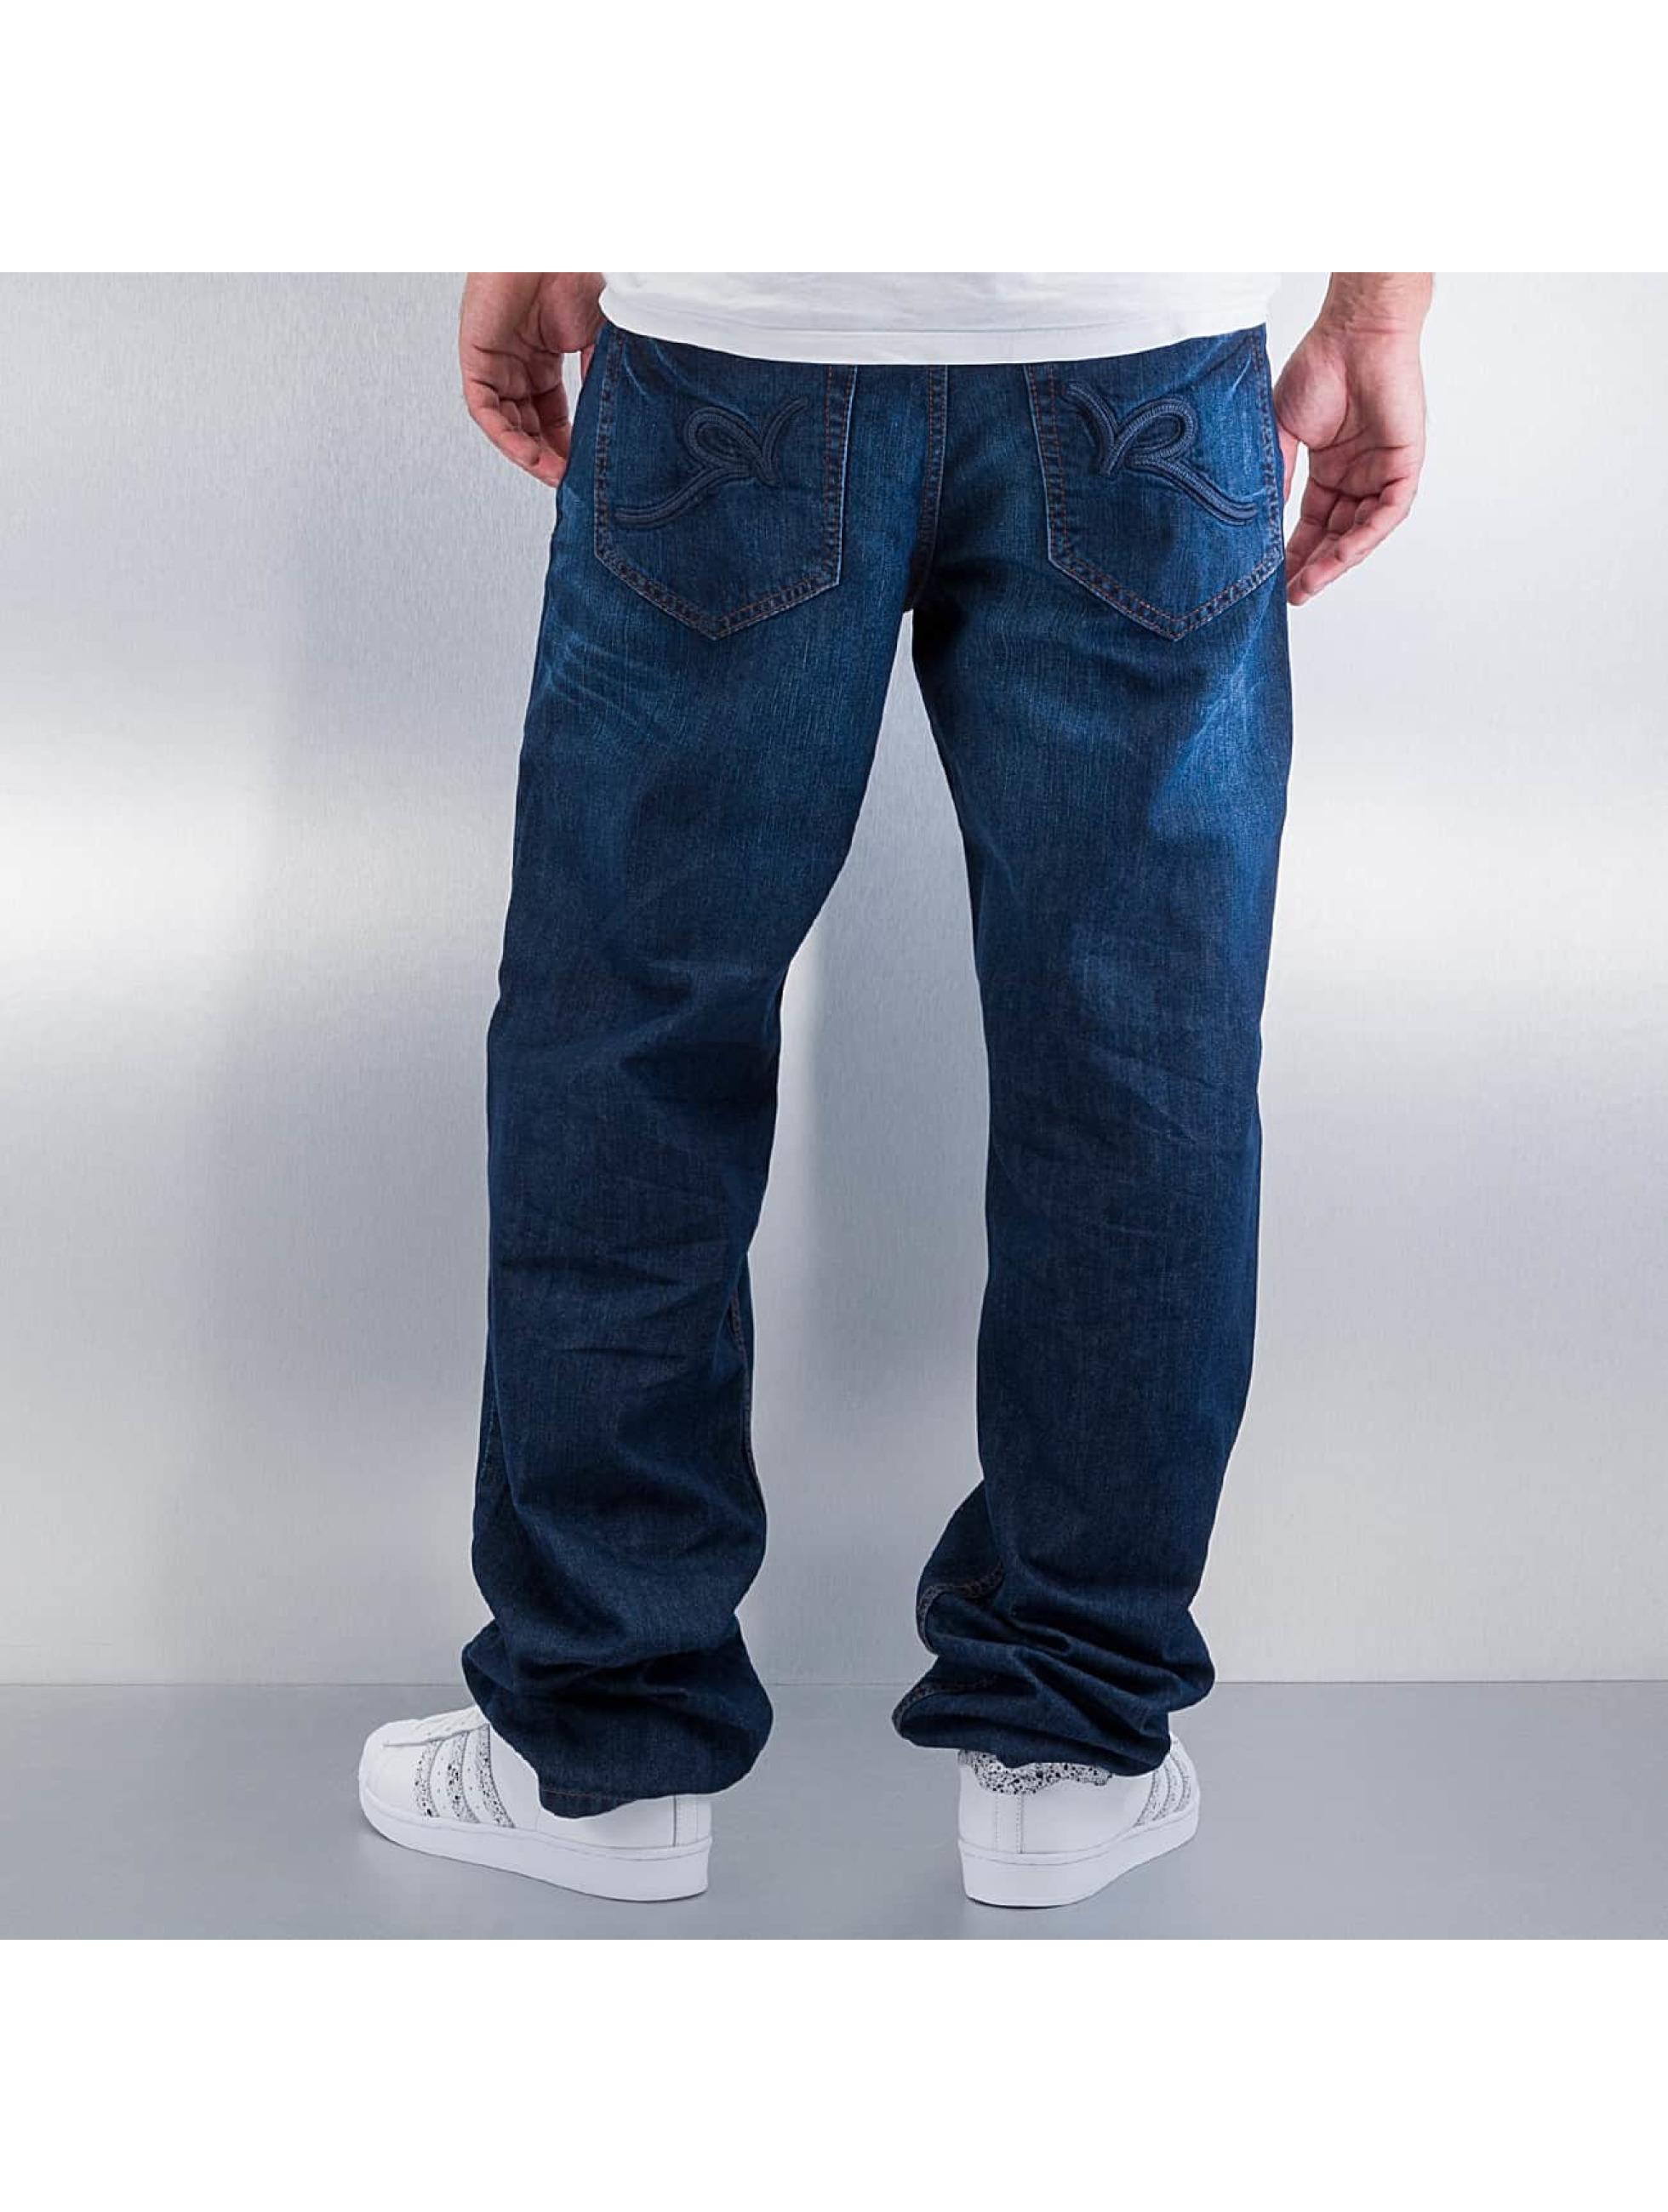 Rocawear Loose Fit Jeans Tap blau